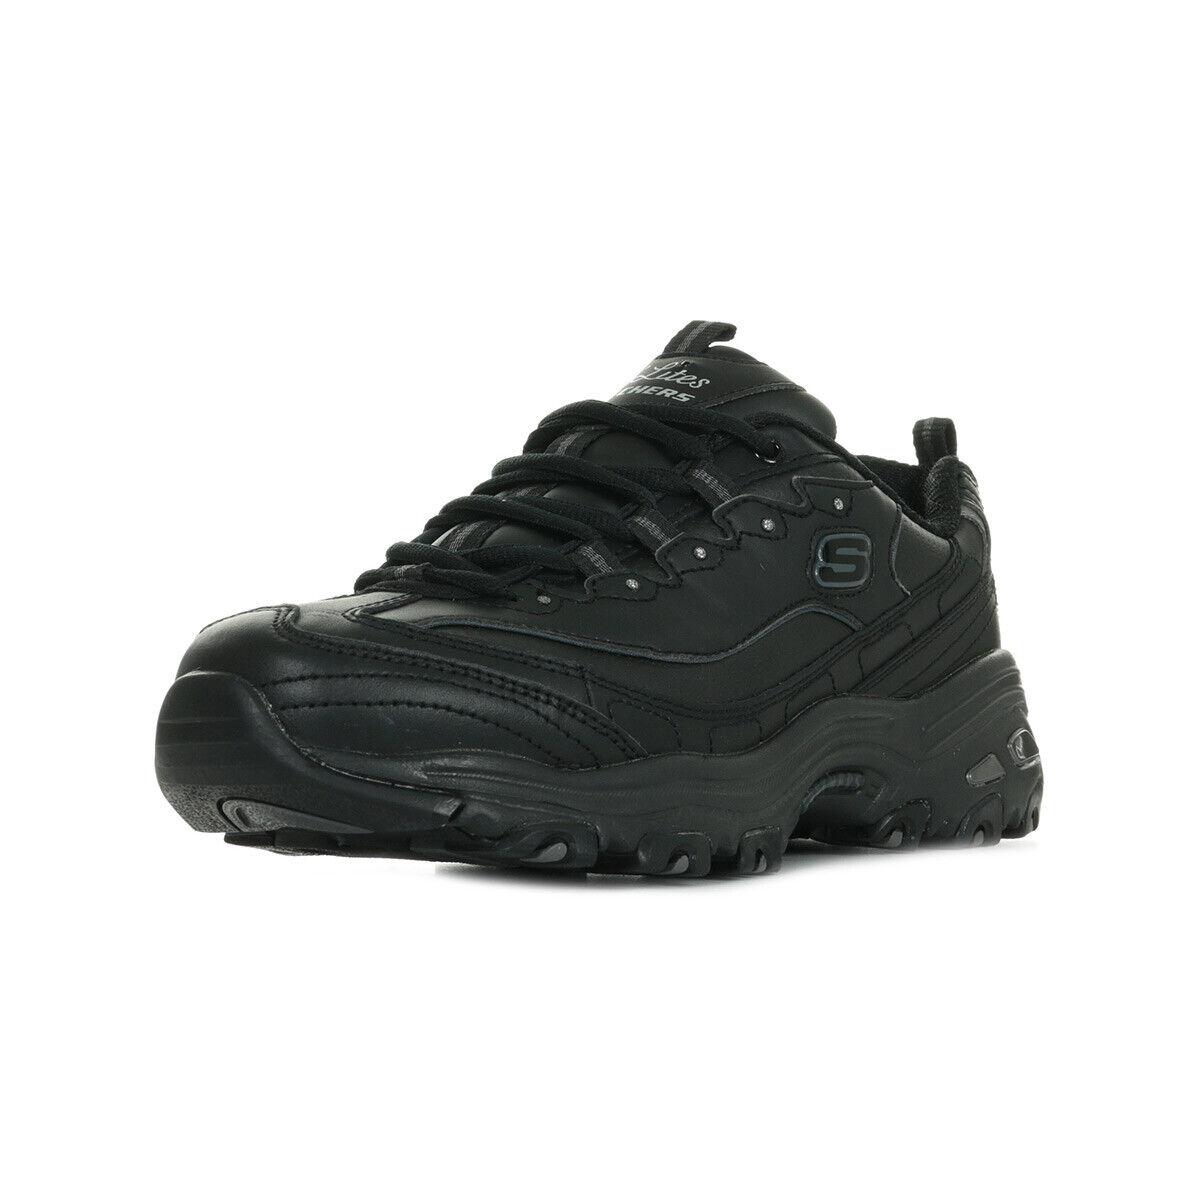 Schuhe Skechers Damen D'Lites Fresh Start schwarz